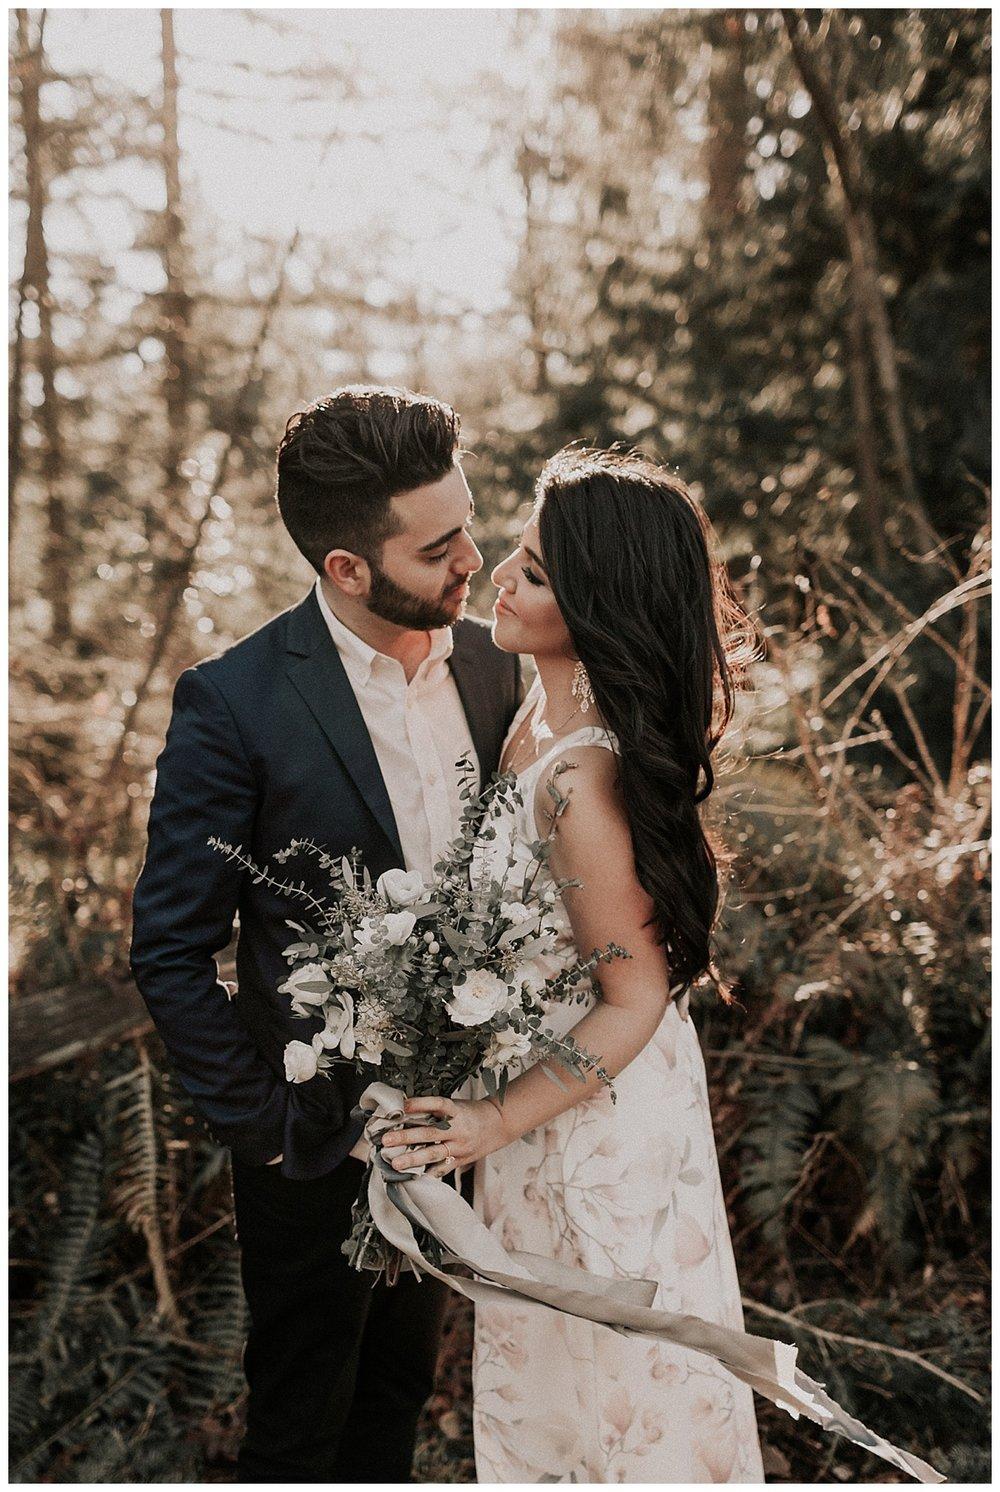 Bixby+Pine-PNW-WeddingPlannersAndDesigners_0882.jpg